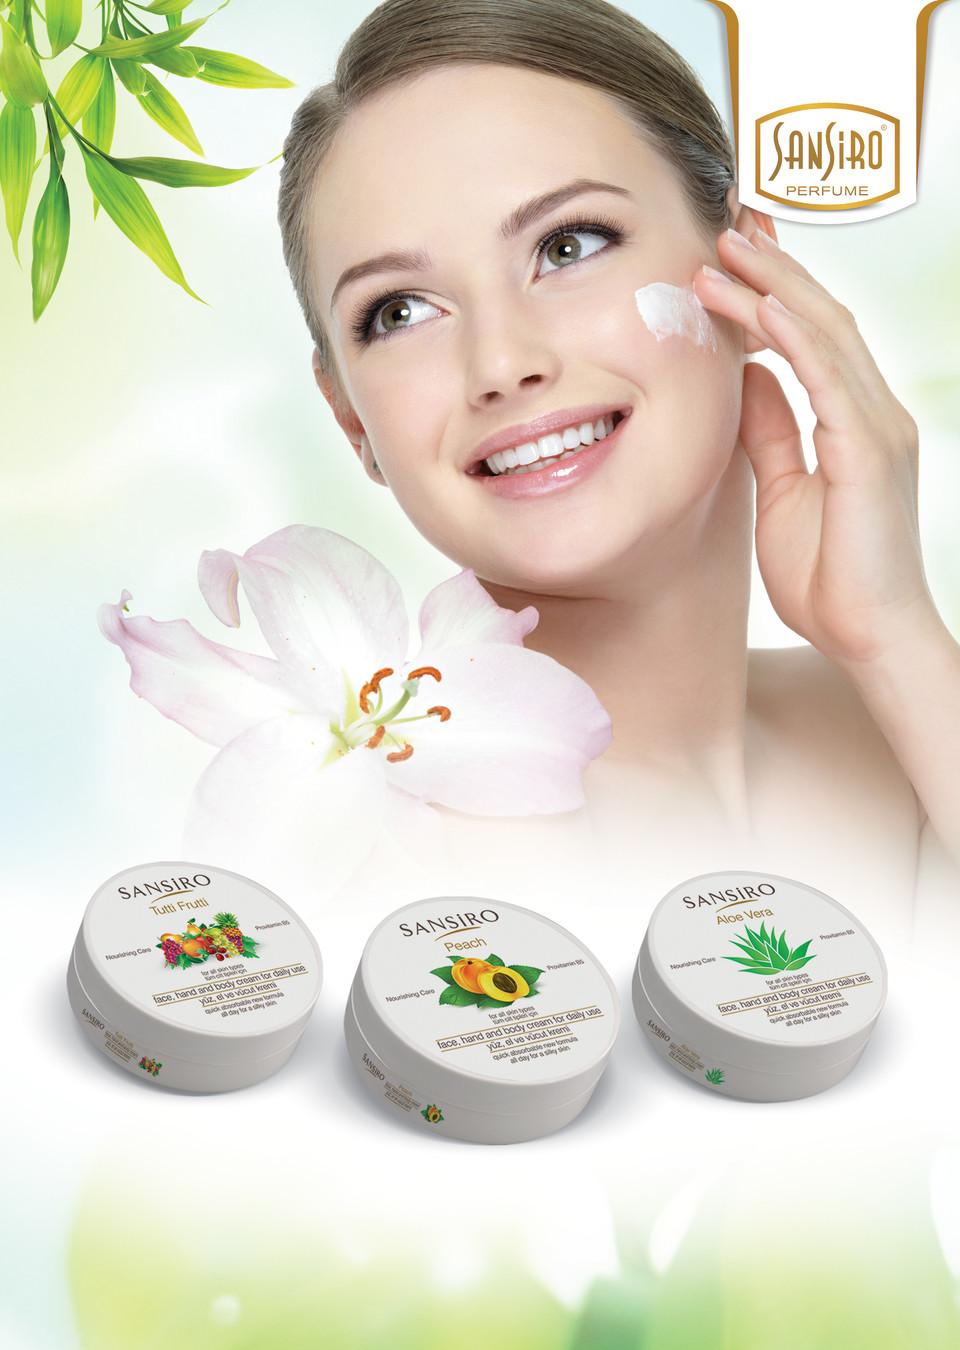 Sansiro Perfume - Sonstiges - Handcreme Aloe Vera